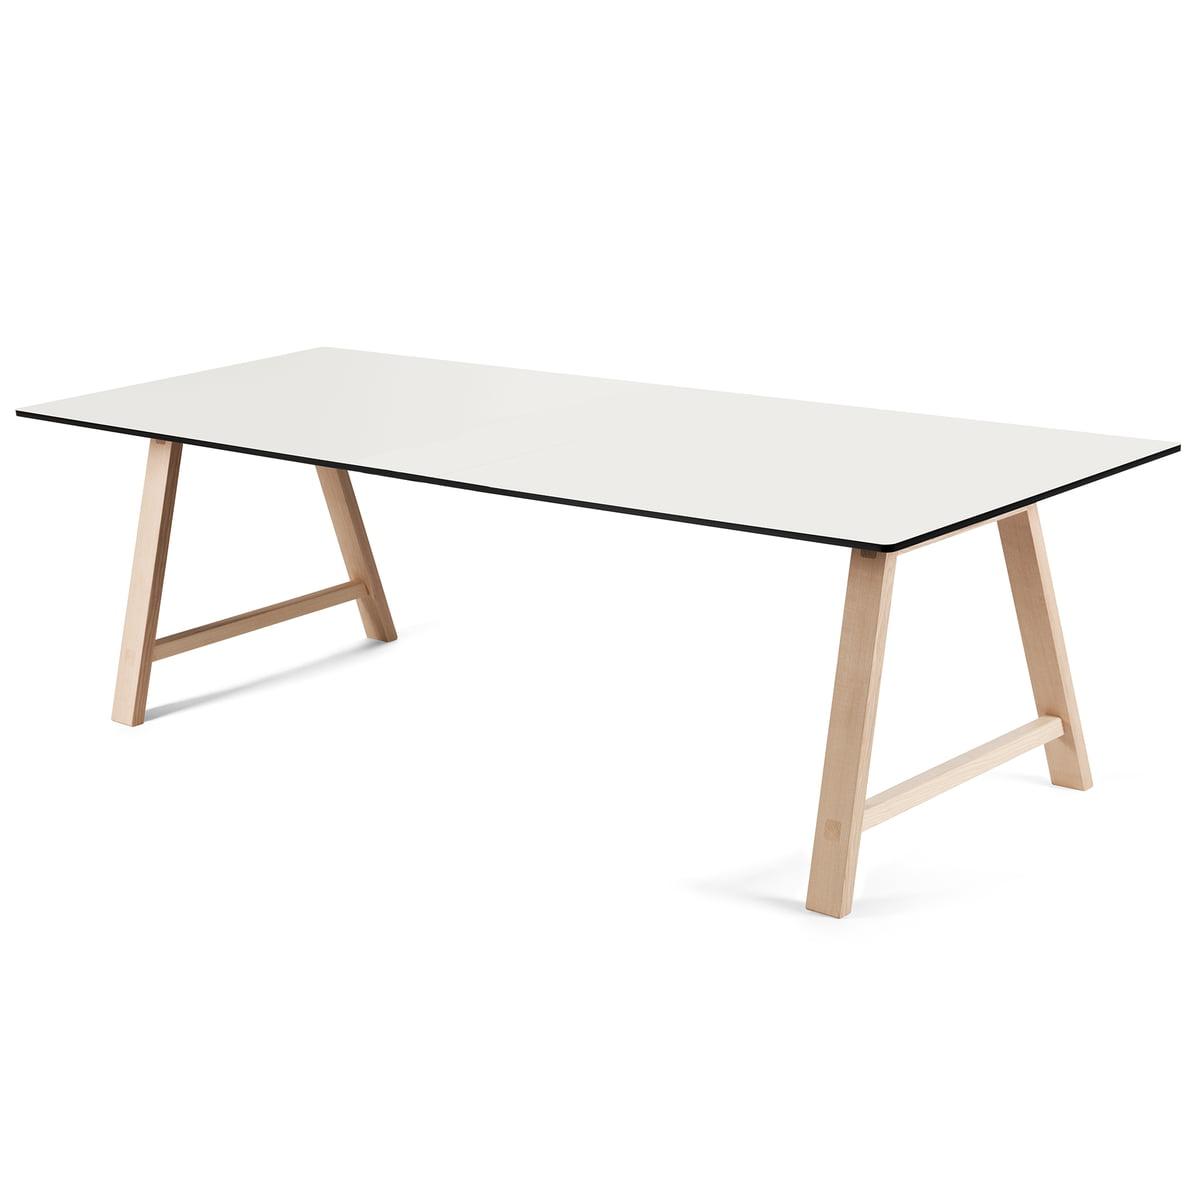 220 Andersen Blanc Savonné T1 Extensible Furniture Stratifié Table CmChêne E9DHWY2I